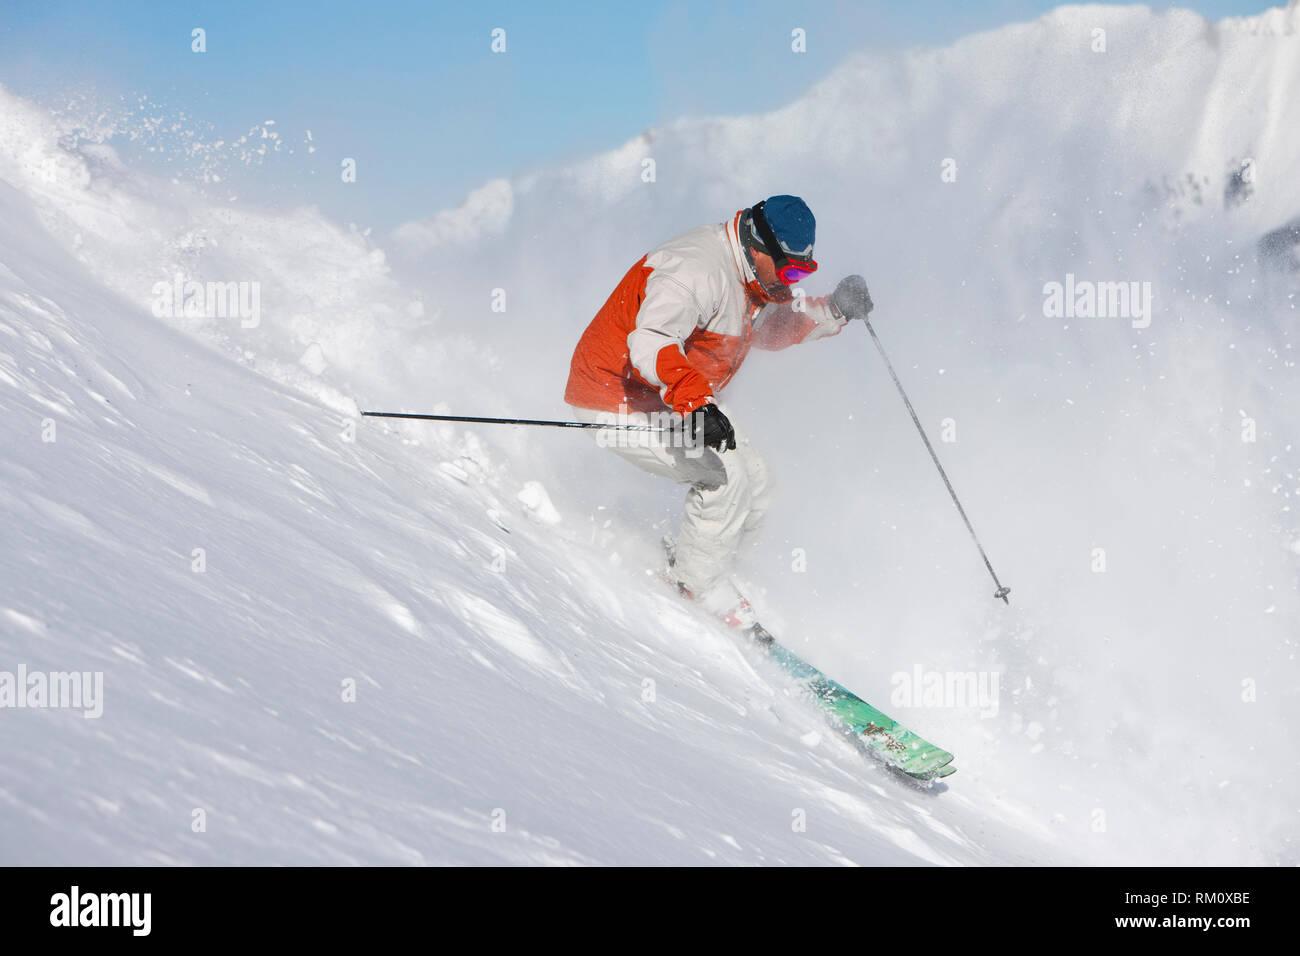 Ski action - Stock Image